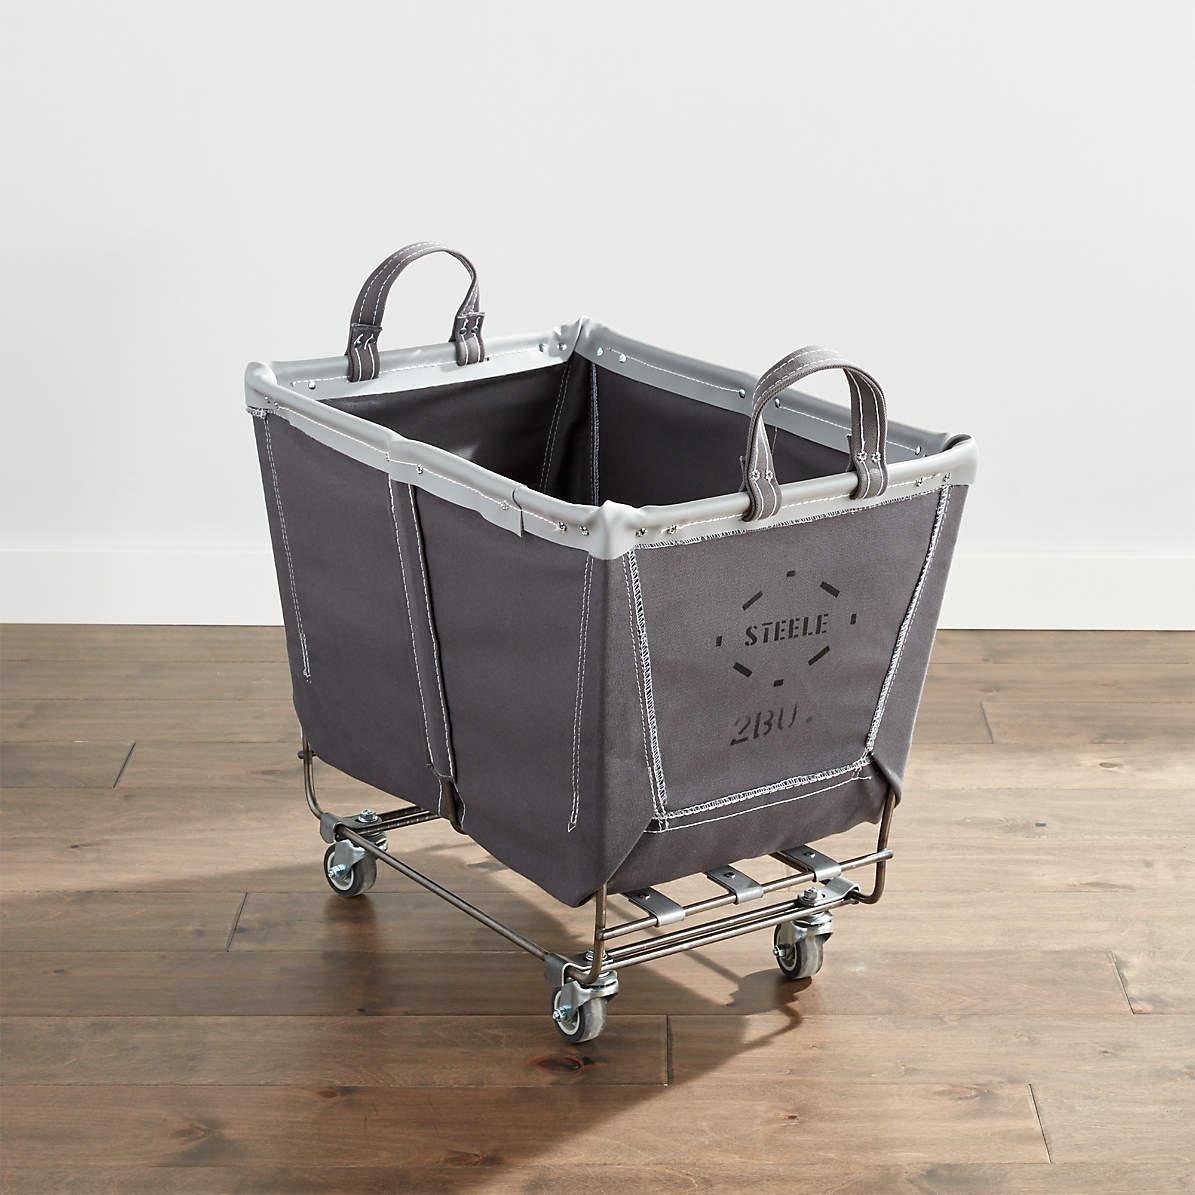 Steele Medium Rolling Laundry Basket Briquette Reviews Crate And Barrel